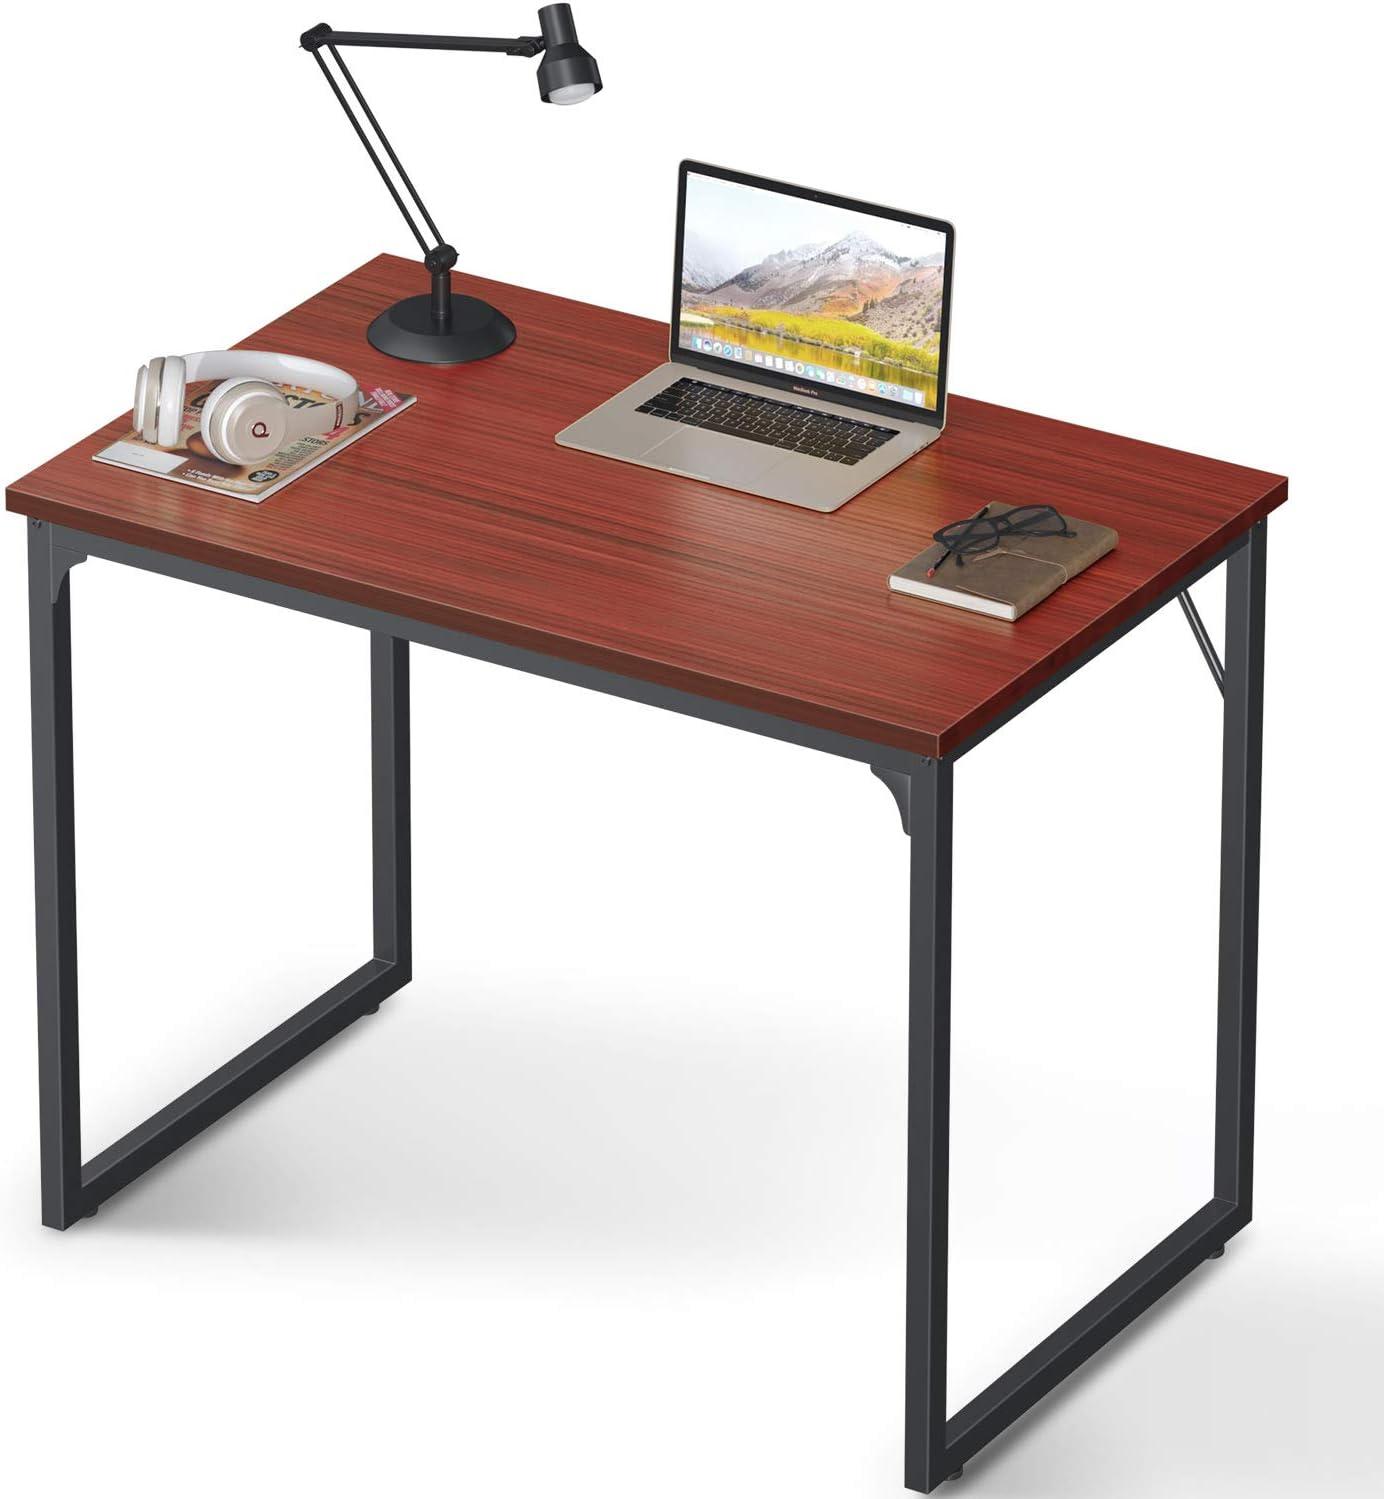 Coleshome Computer Desk 31